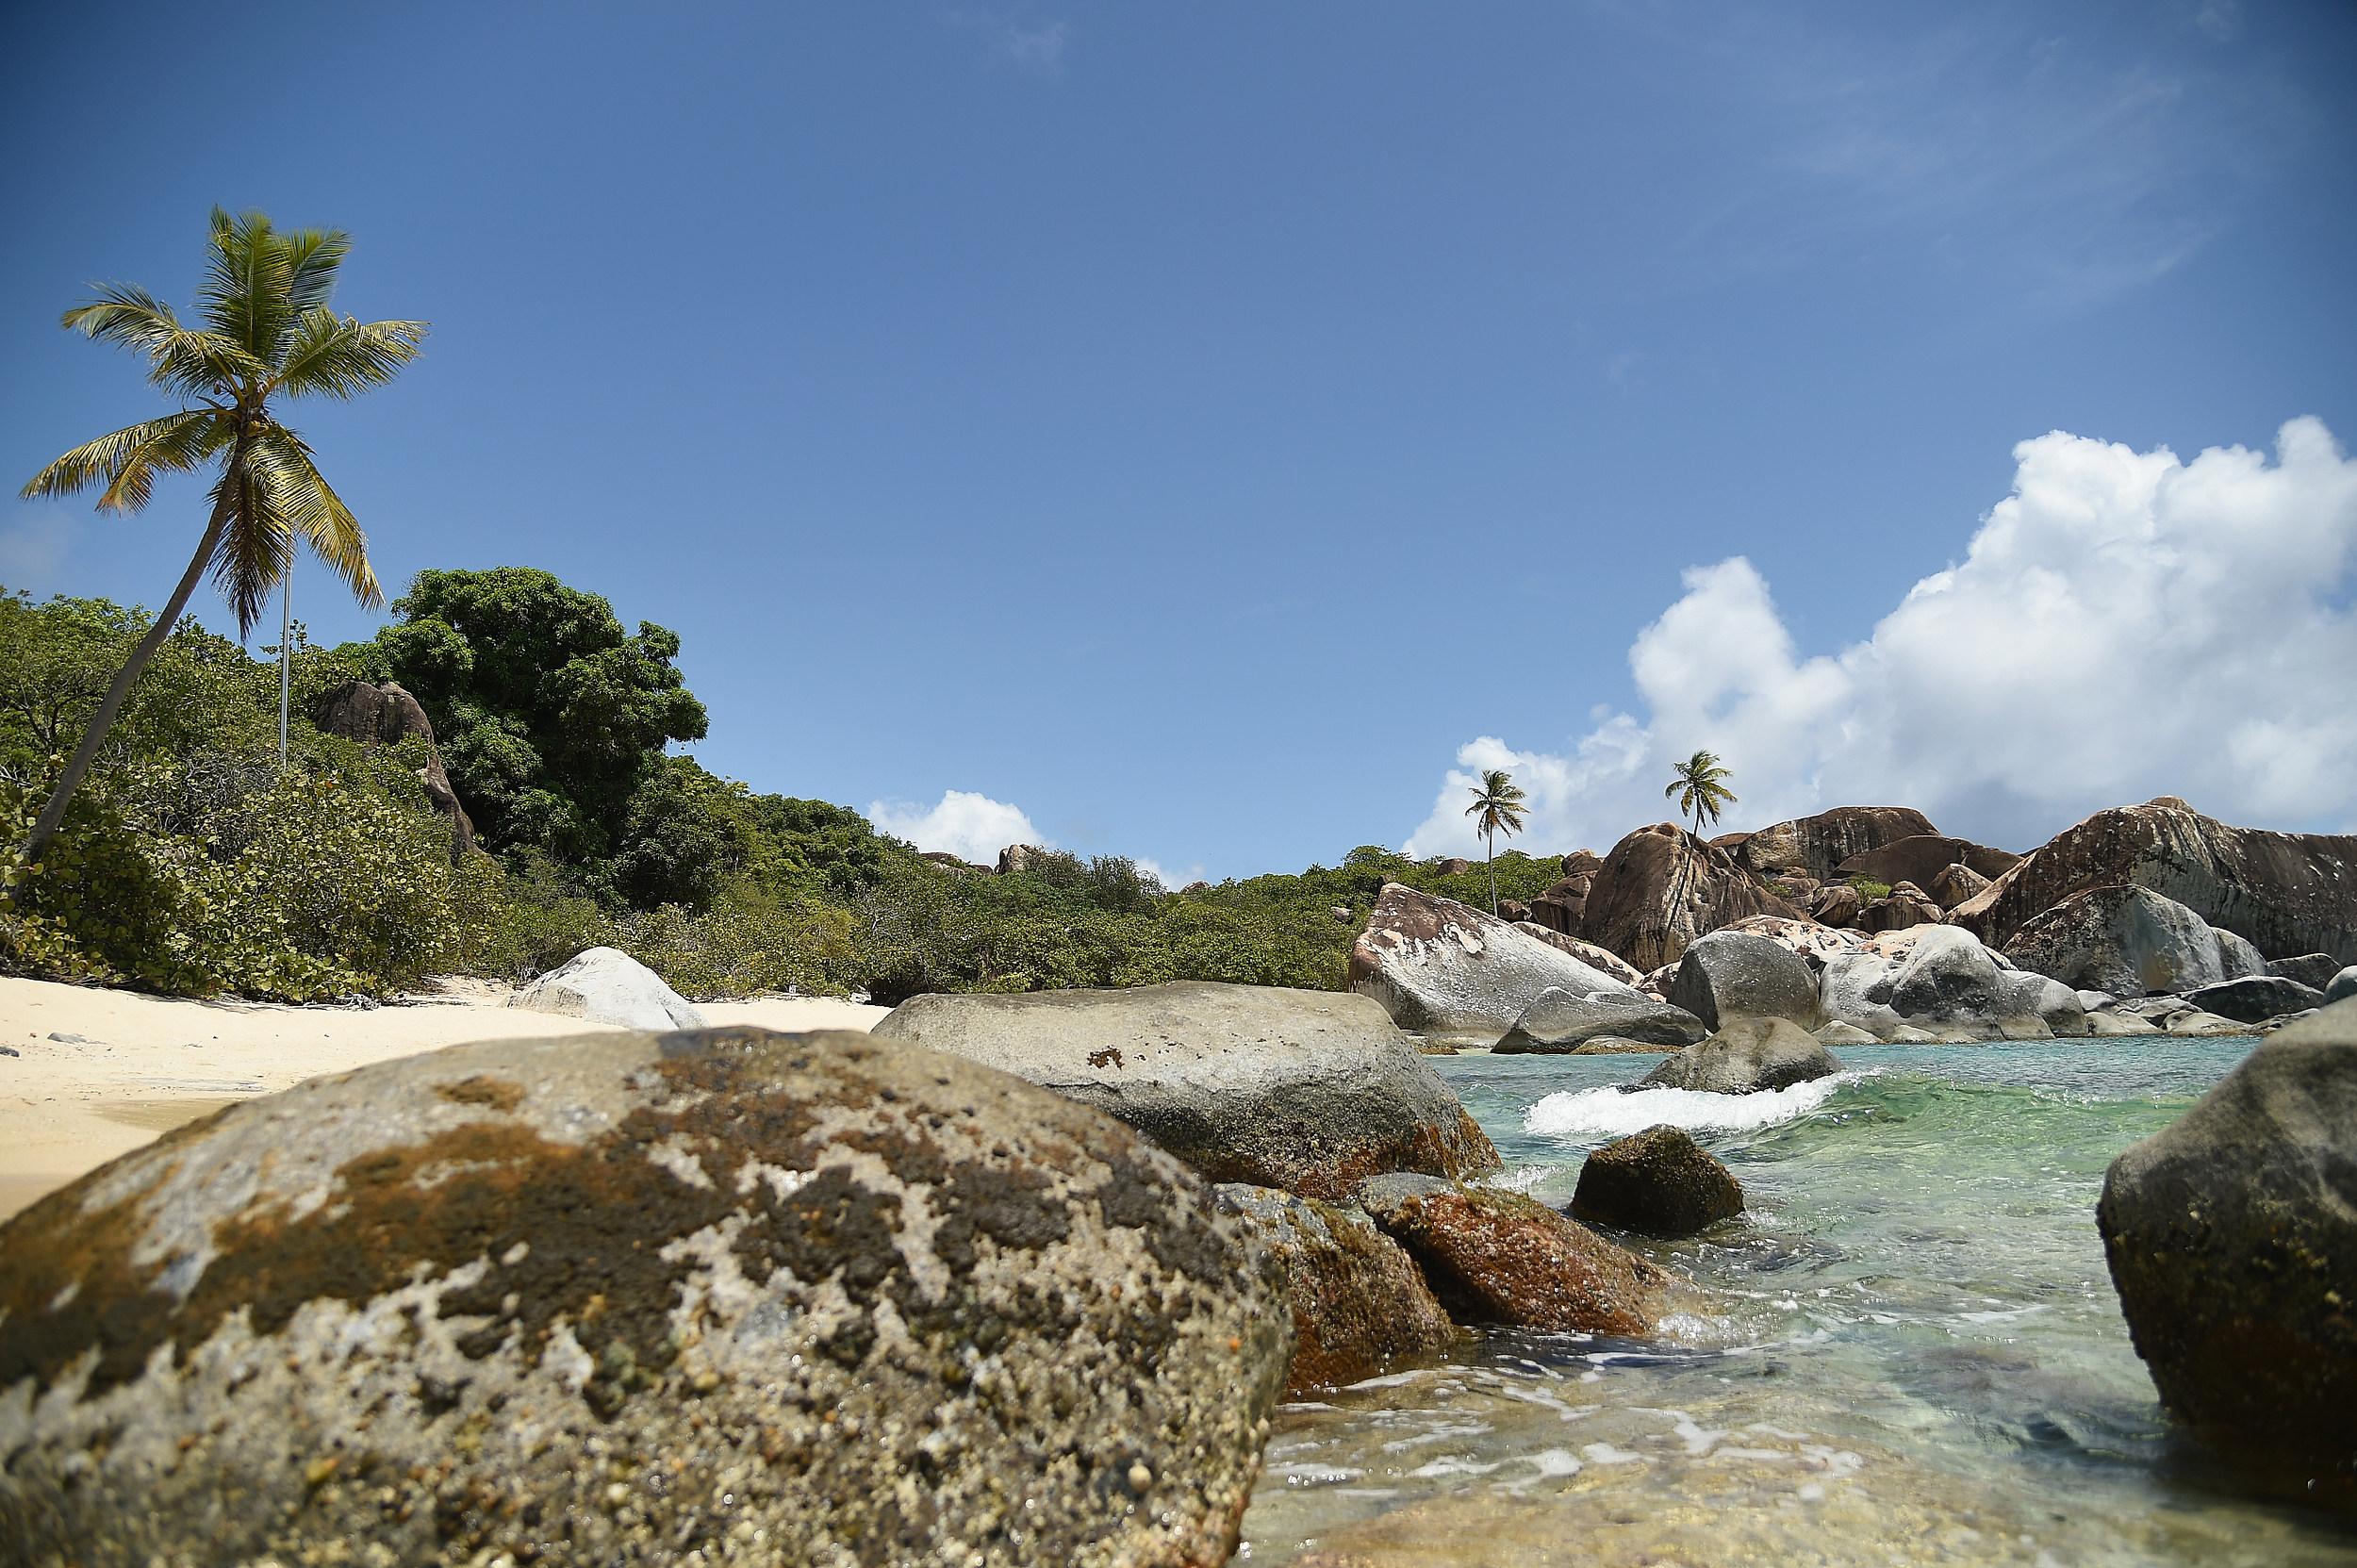 Tropical Paradise - The Virgin Islands